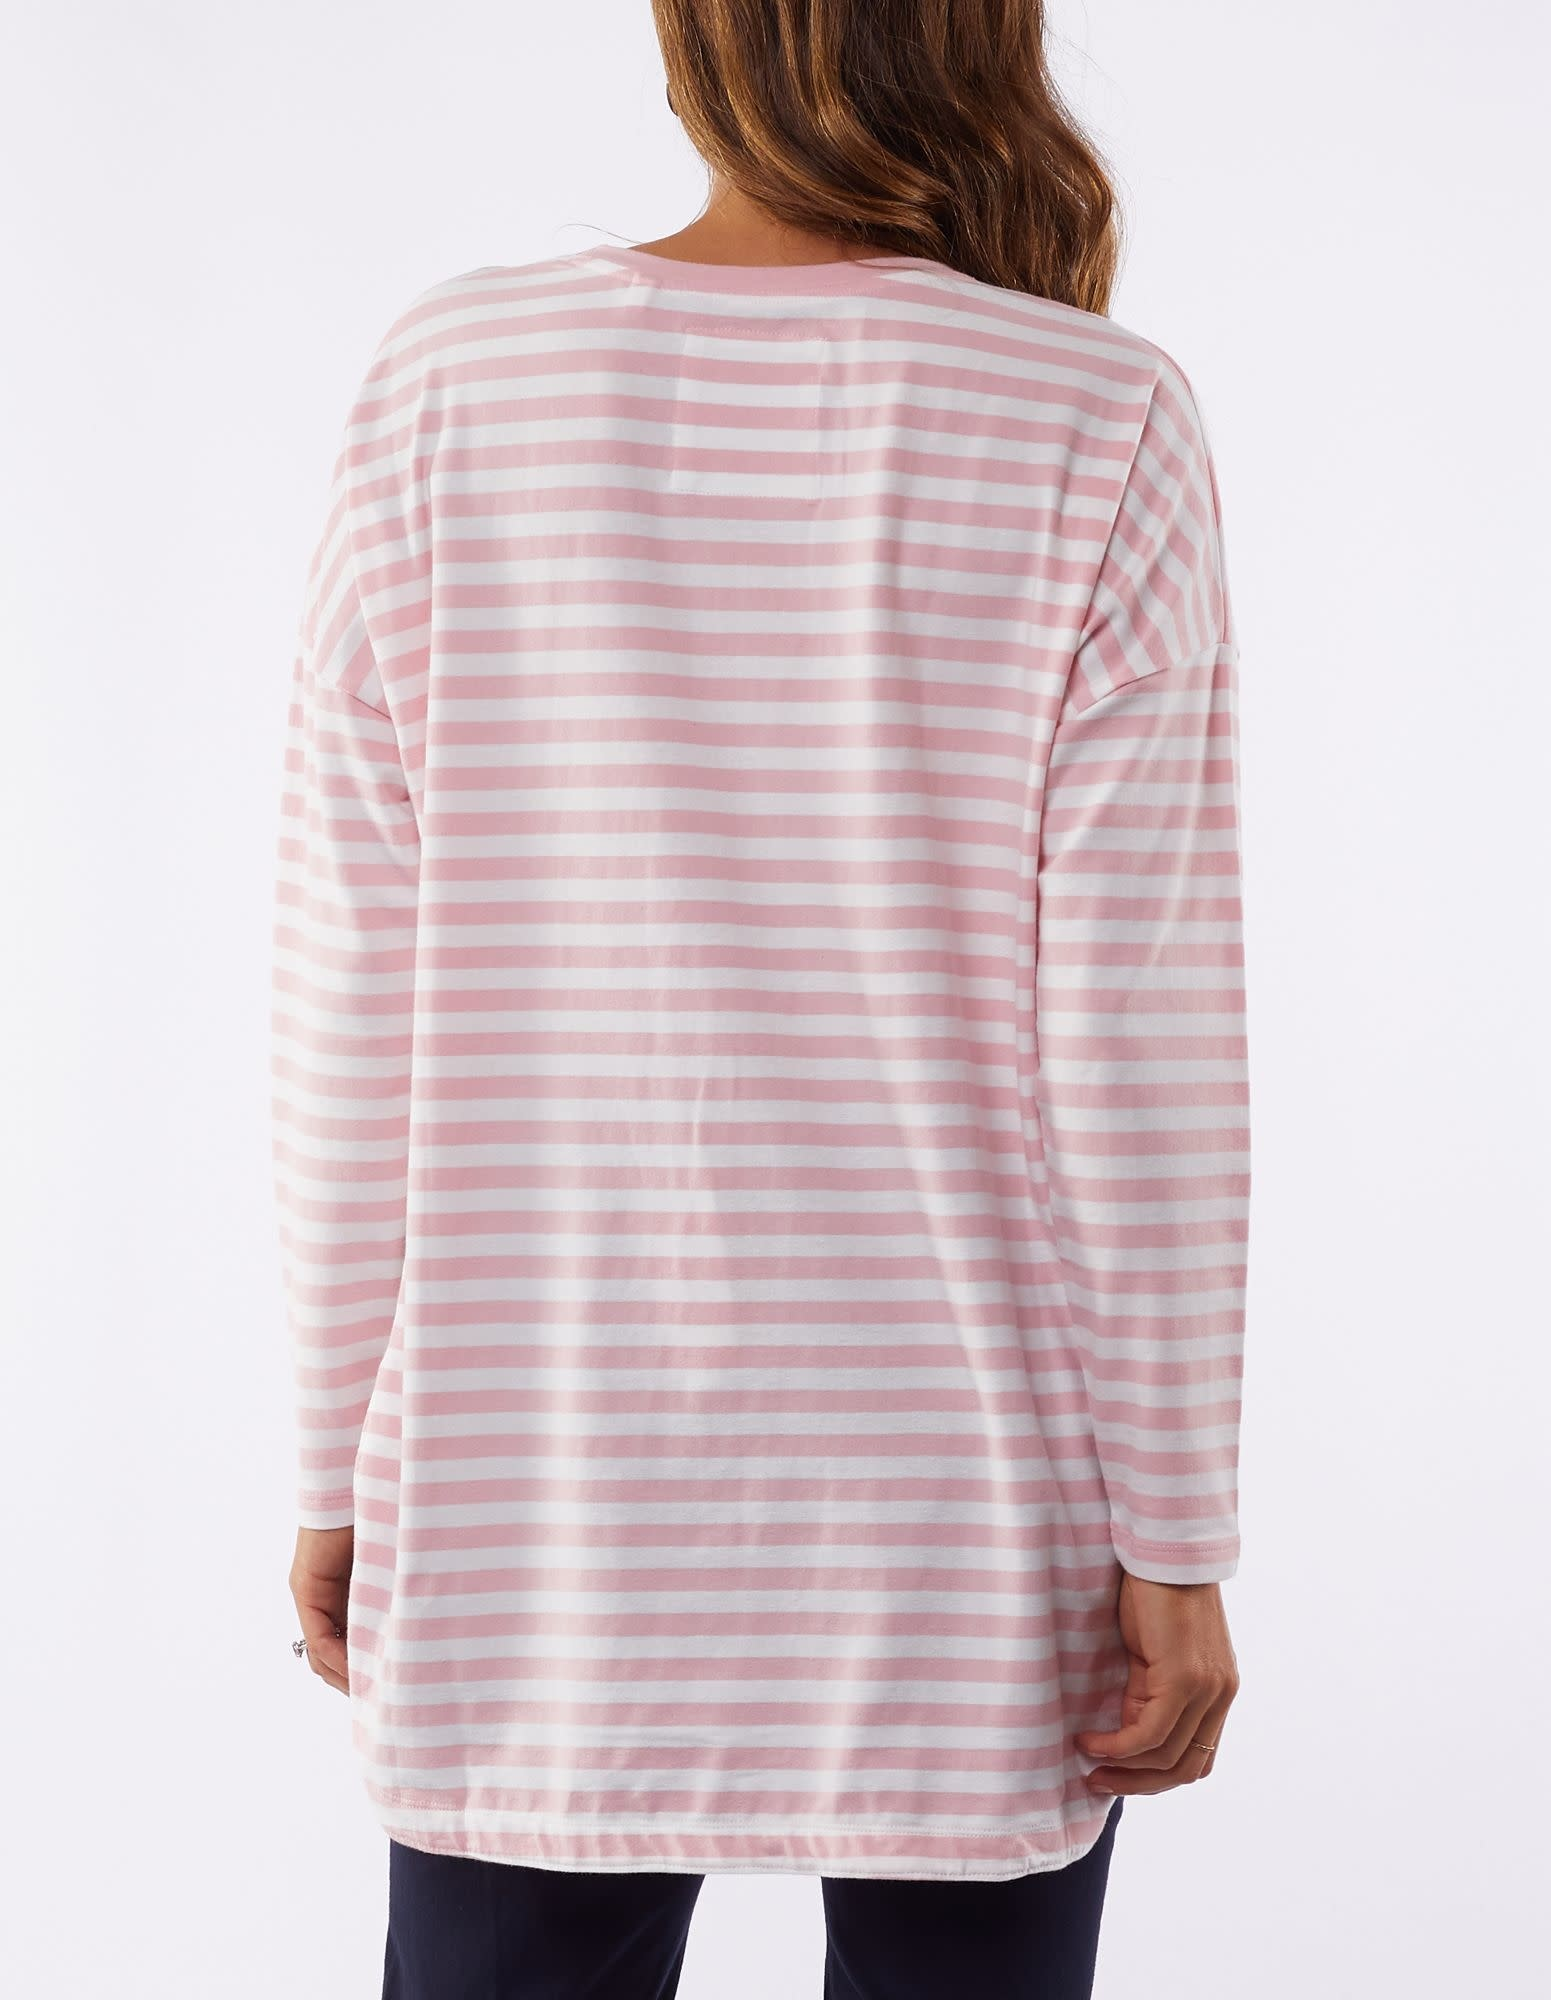 Elm Society Pink Stripe Tee